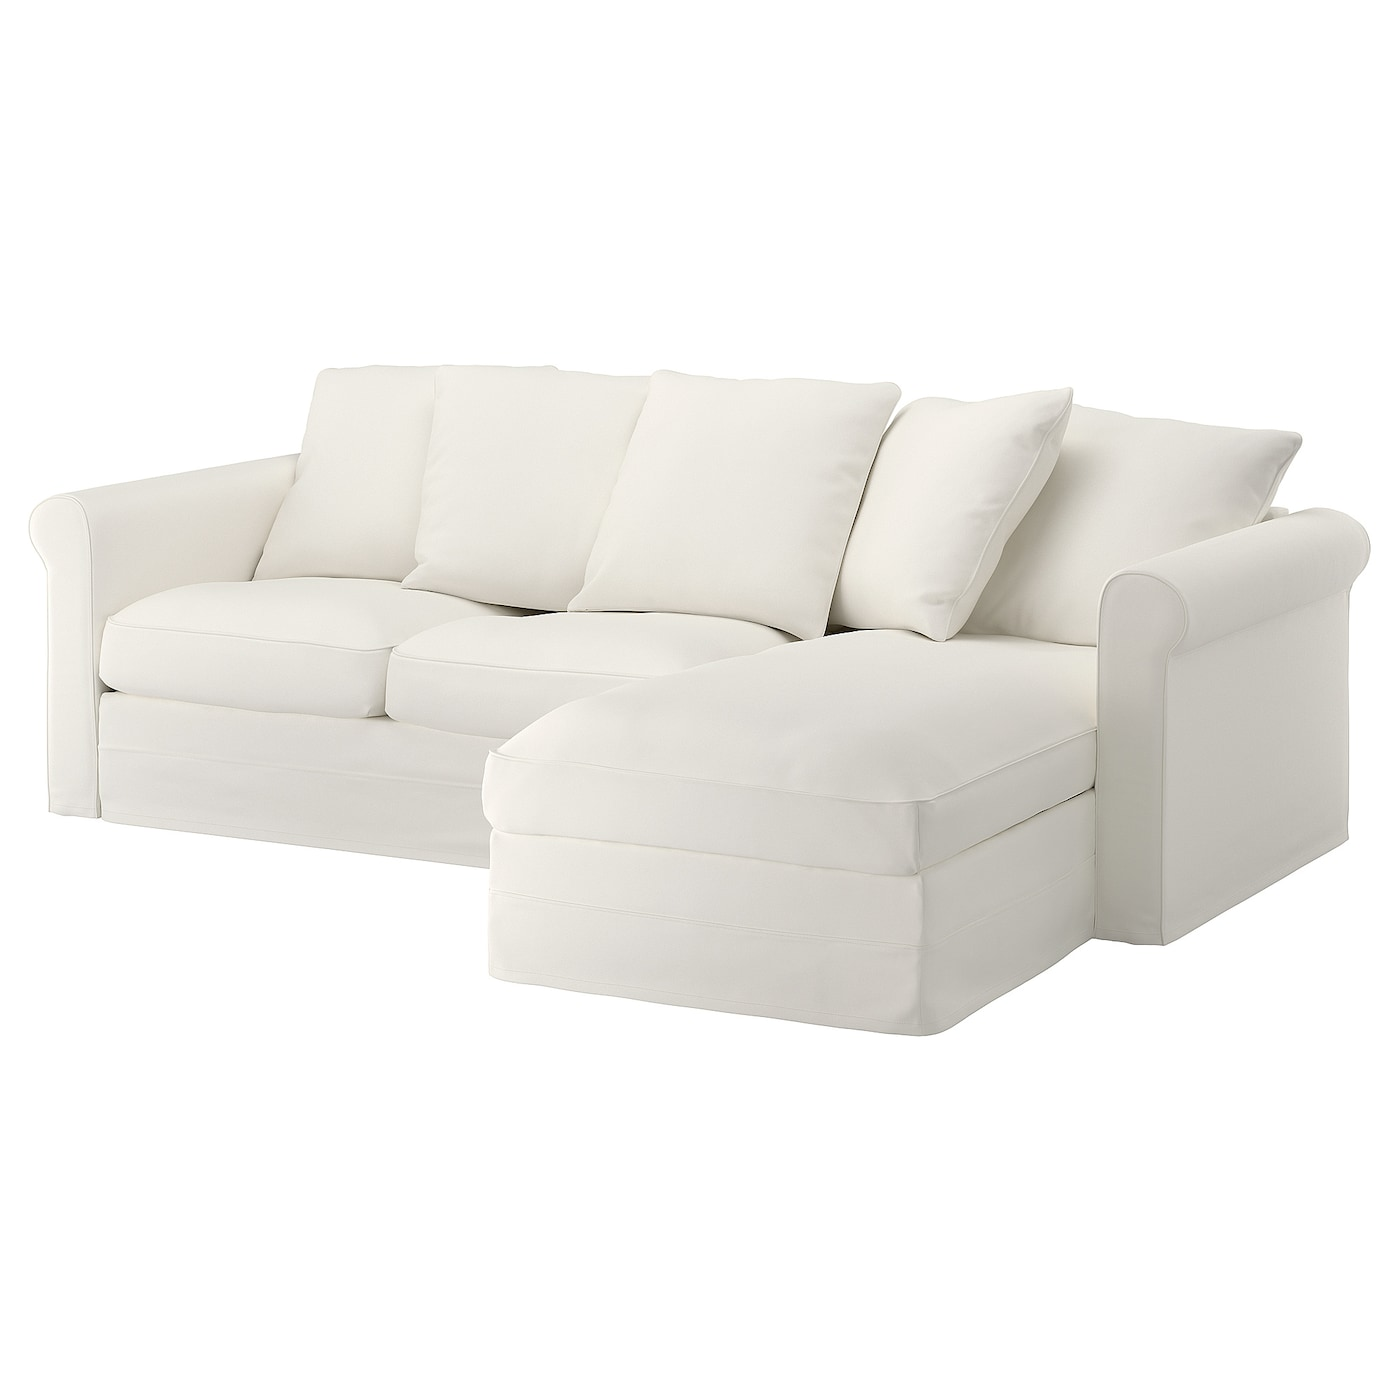 Fine 3 Seat Sofa Gronlid With Chaise Longue Inseros White Uwap Interior Chair Design Uwaporg